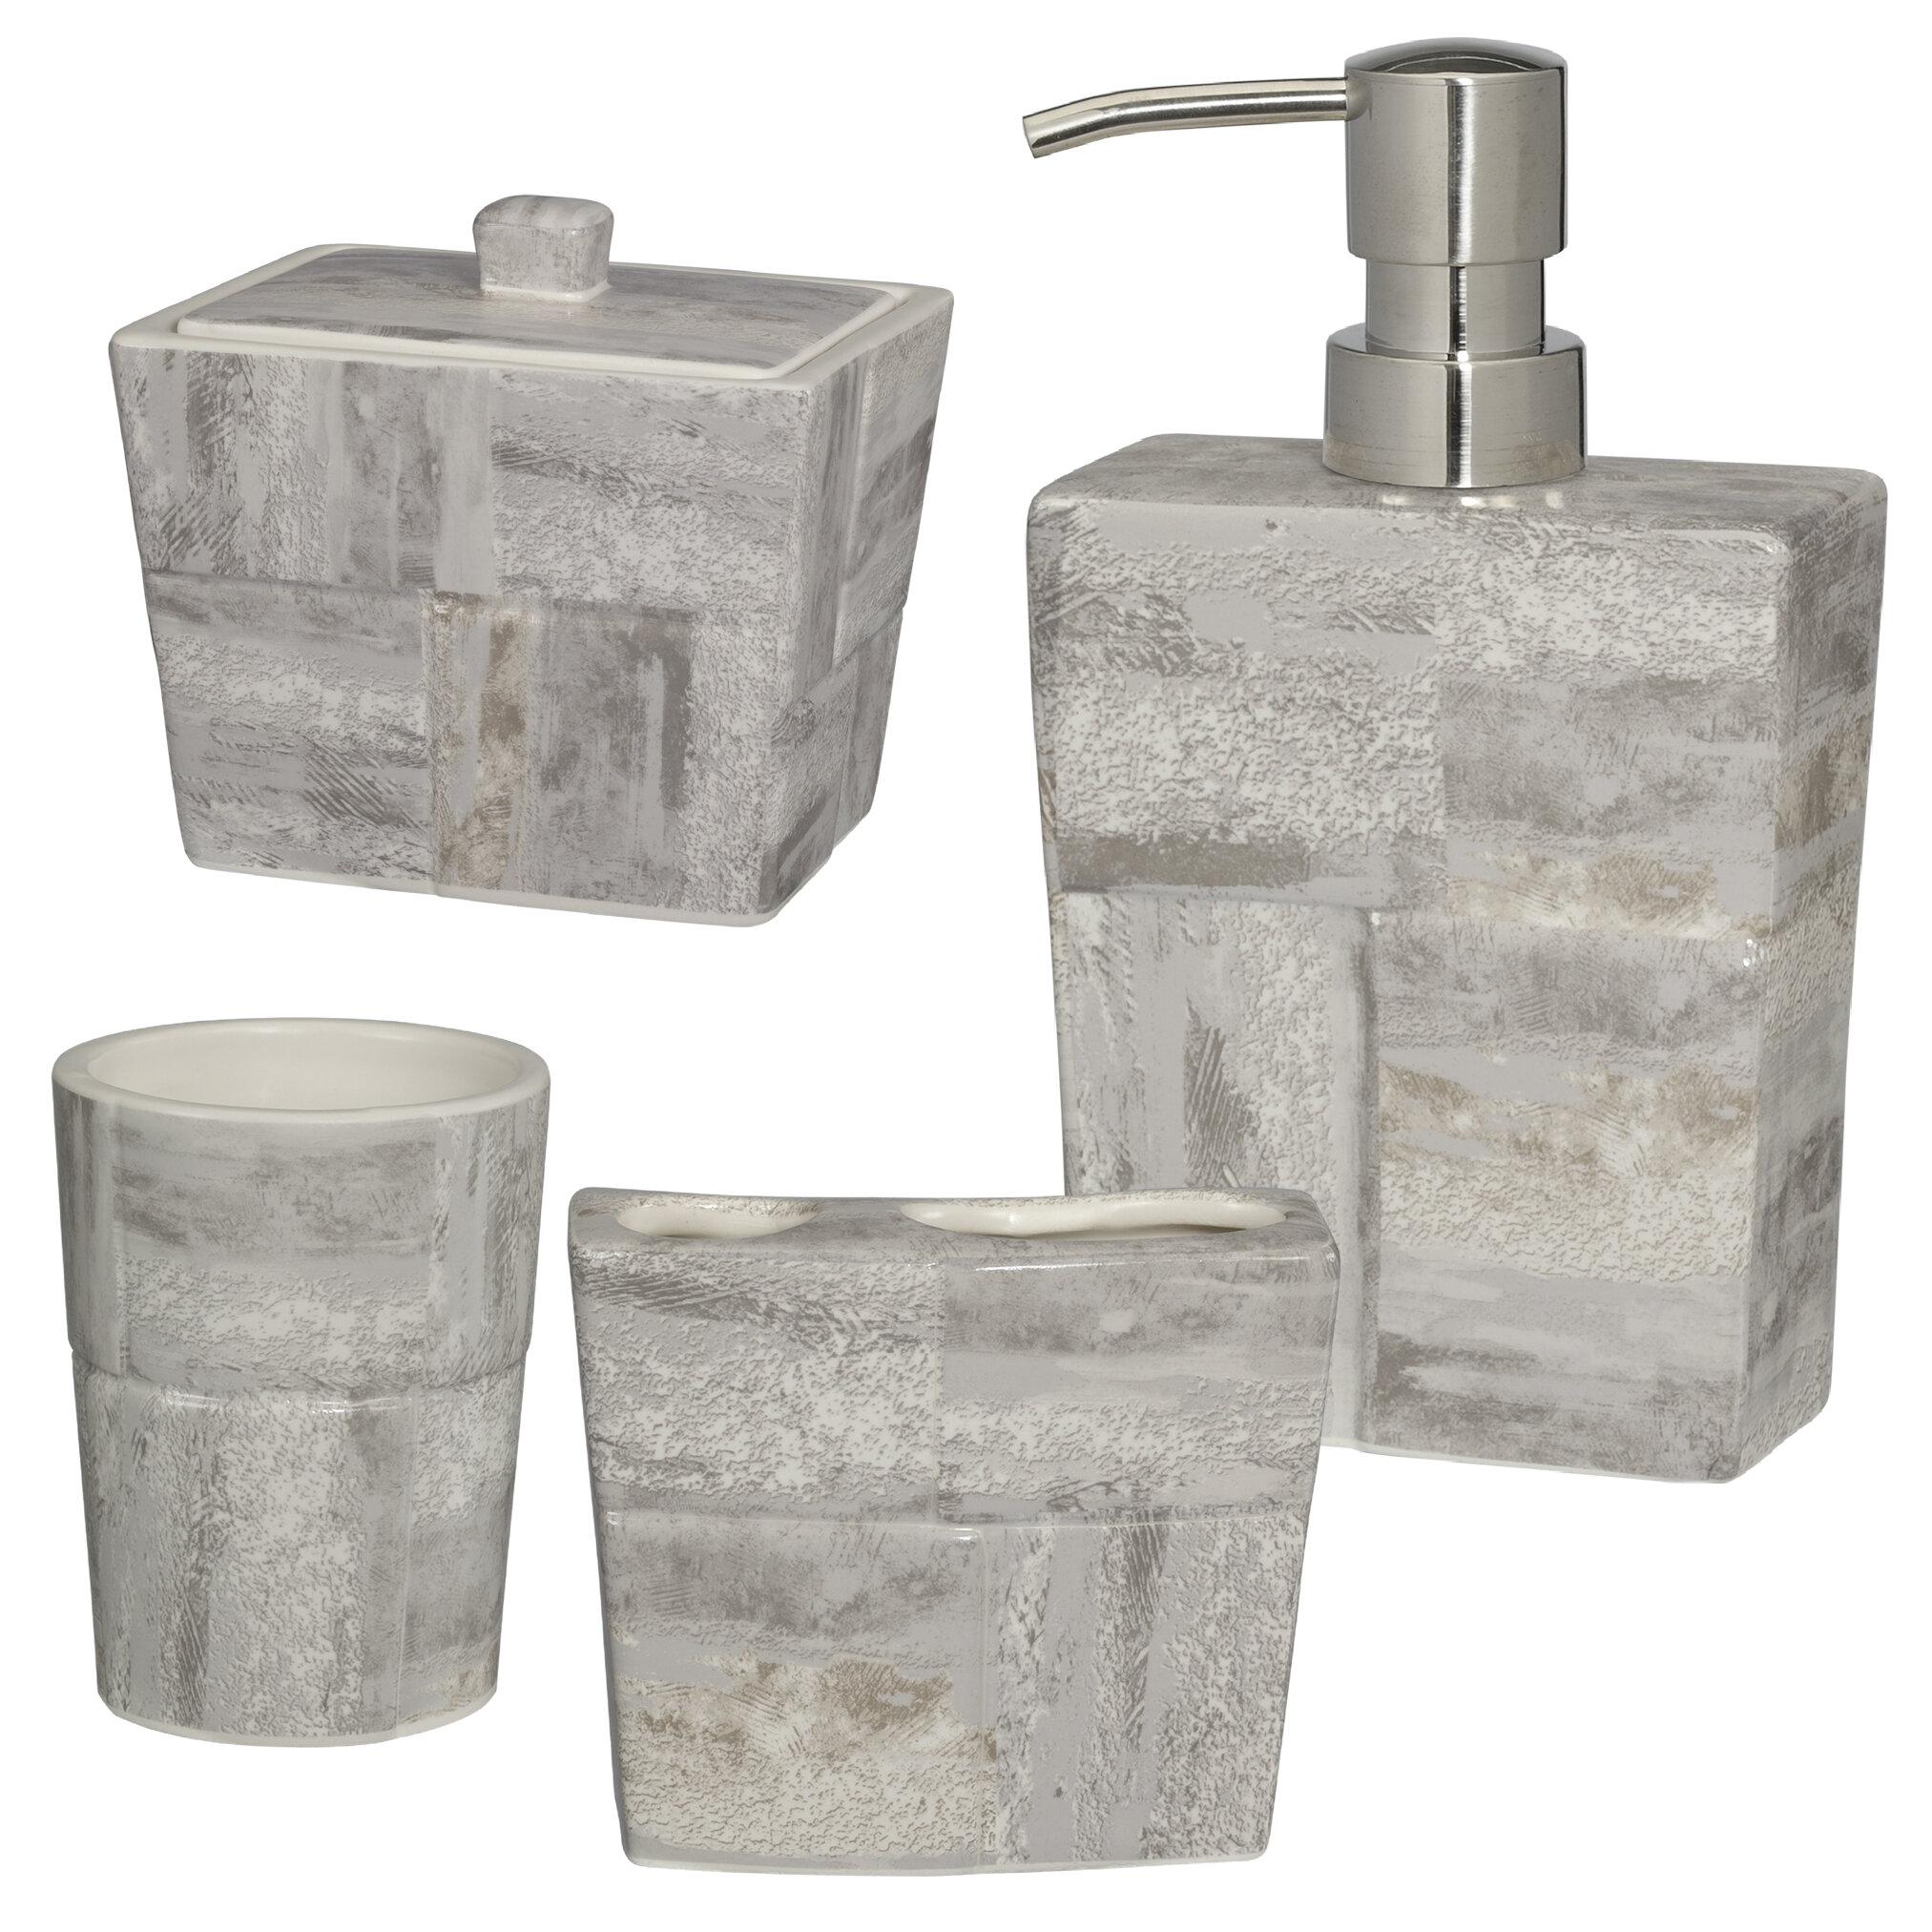 Union Rustic Tereza Quarry 4 Piece Bathroom Accessory Set Reviews Wayfair